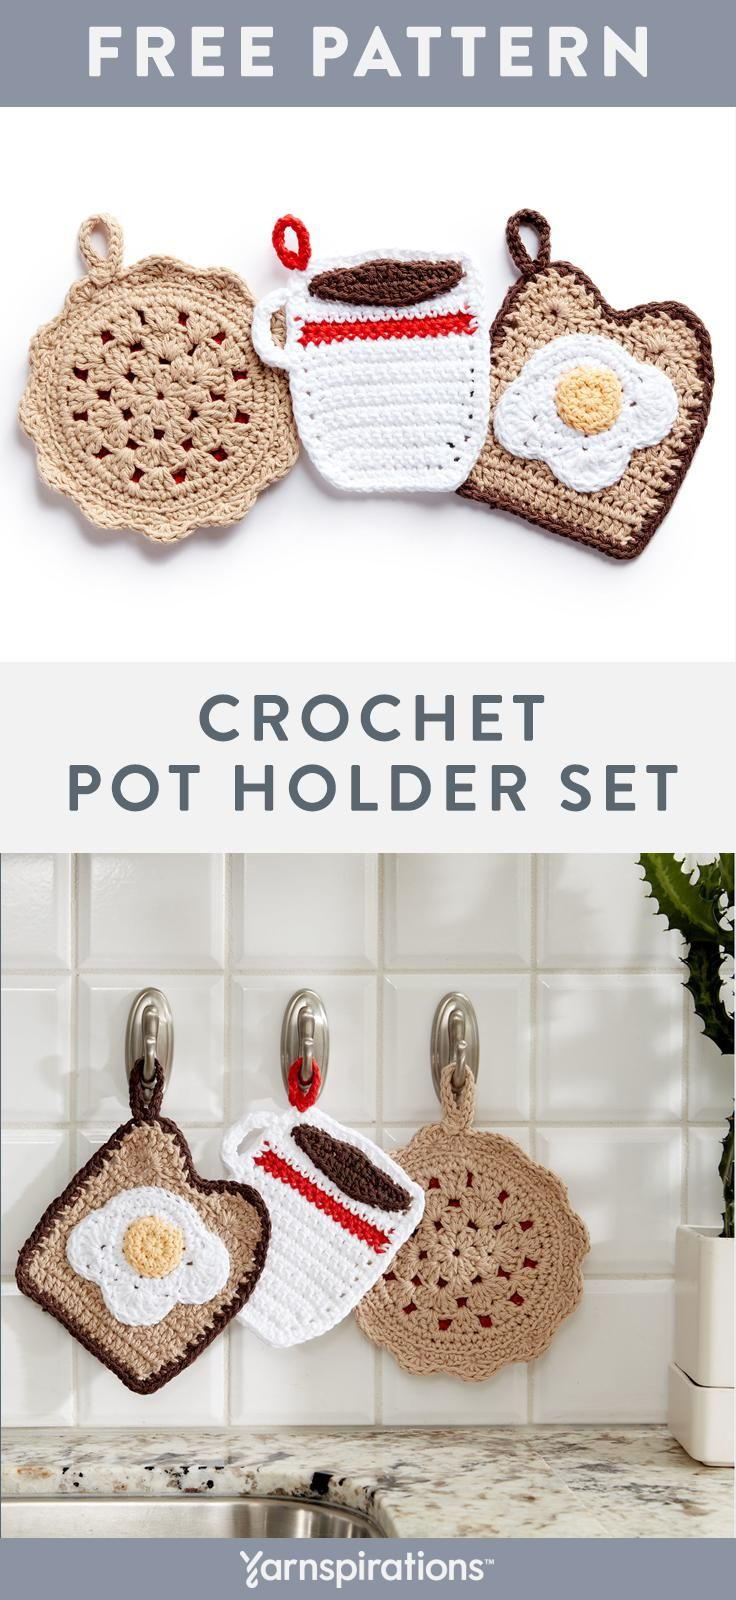 Free Decorative Crochet Pot Holder Patterns Hostess Gift Ideas By Tashiab Basic Granny Square Stitch Diagram Yarnspirations Lilysugarncream Freecrochetpattern